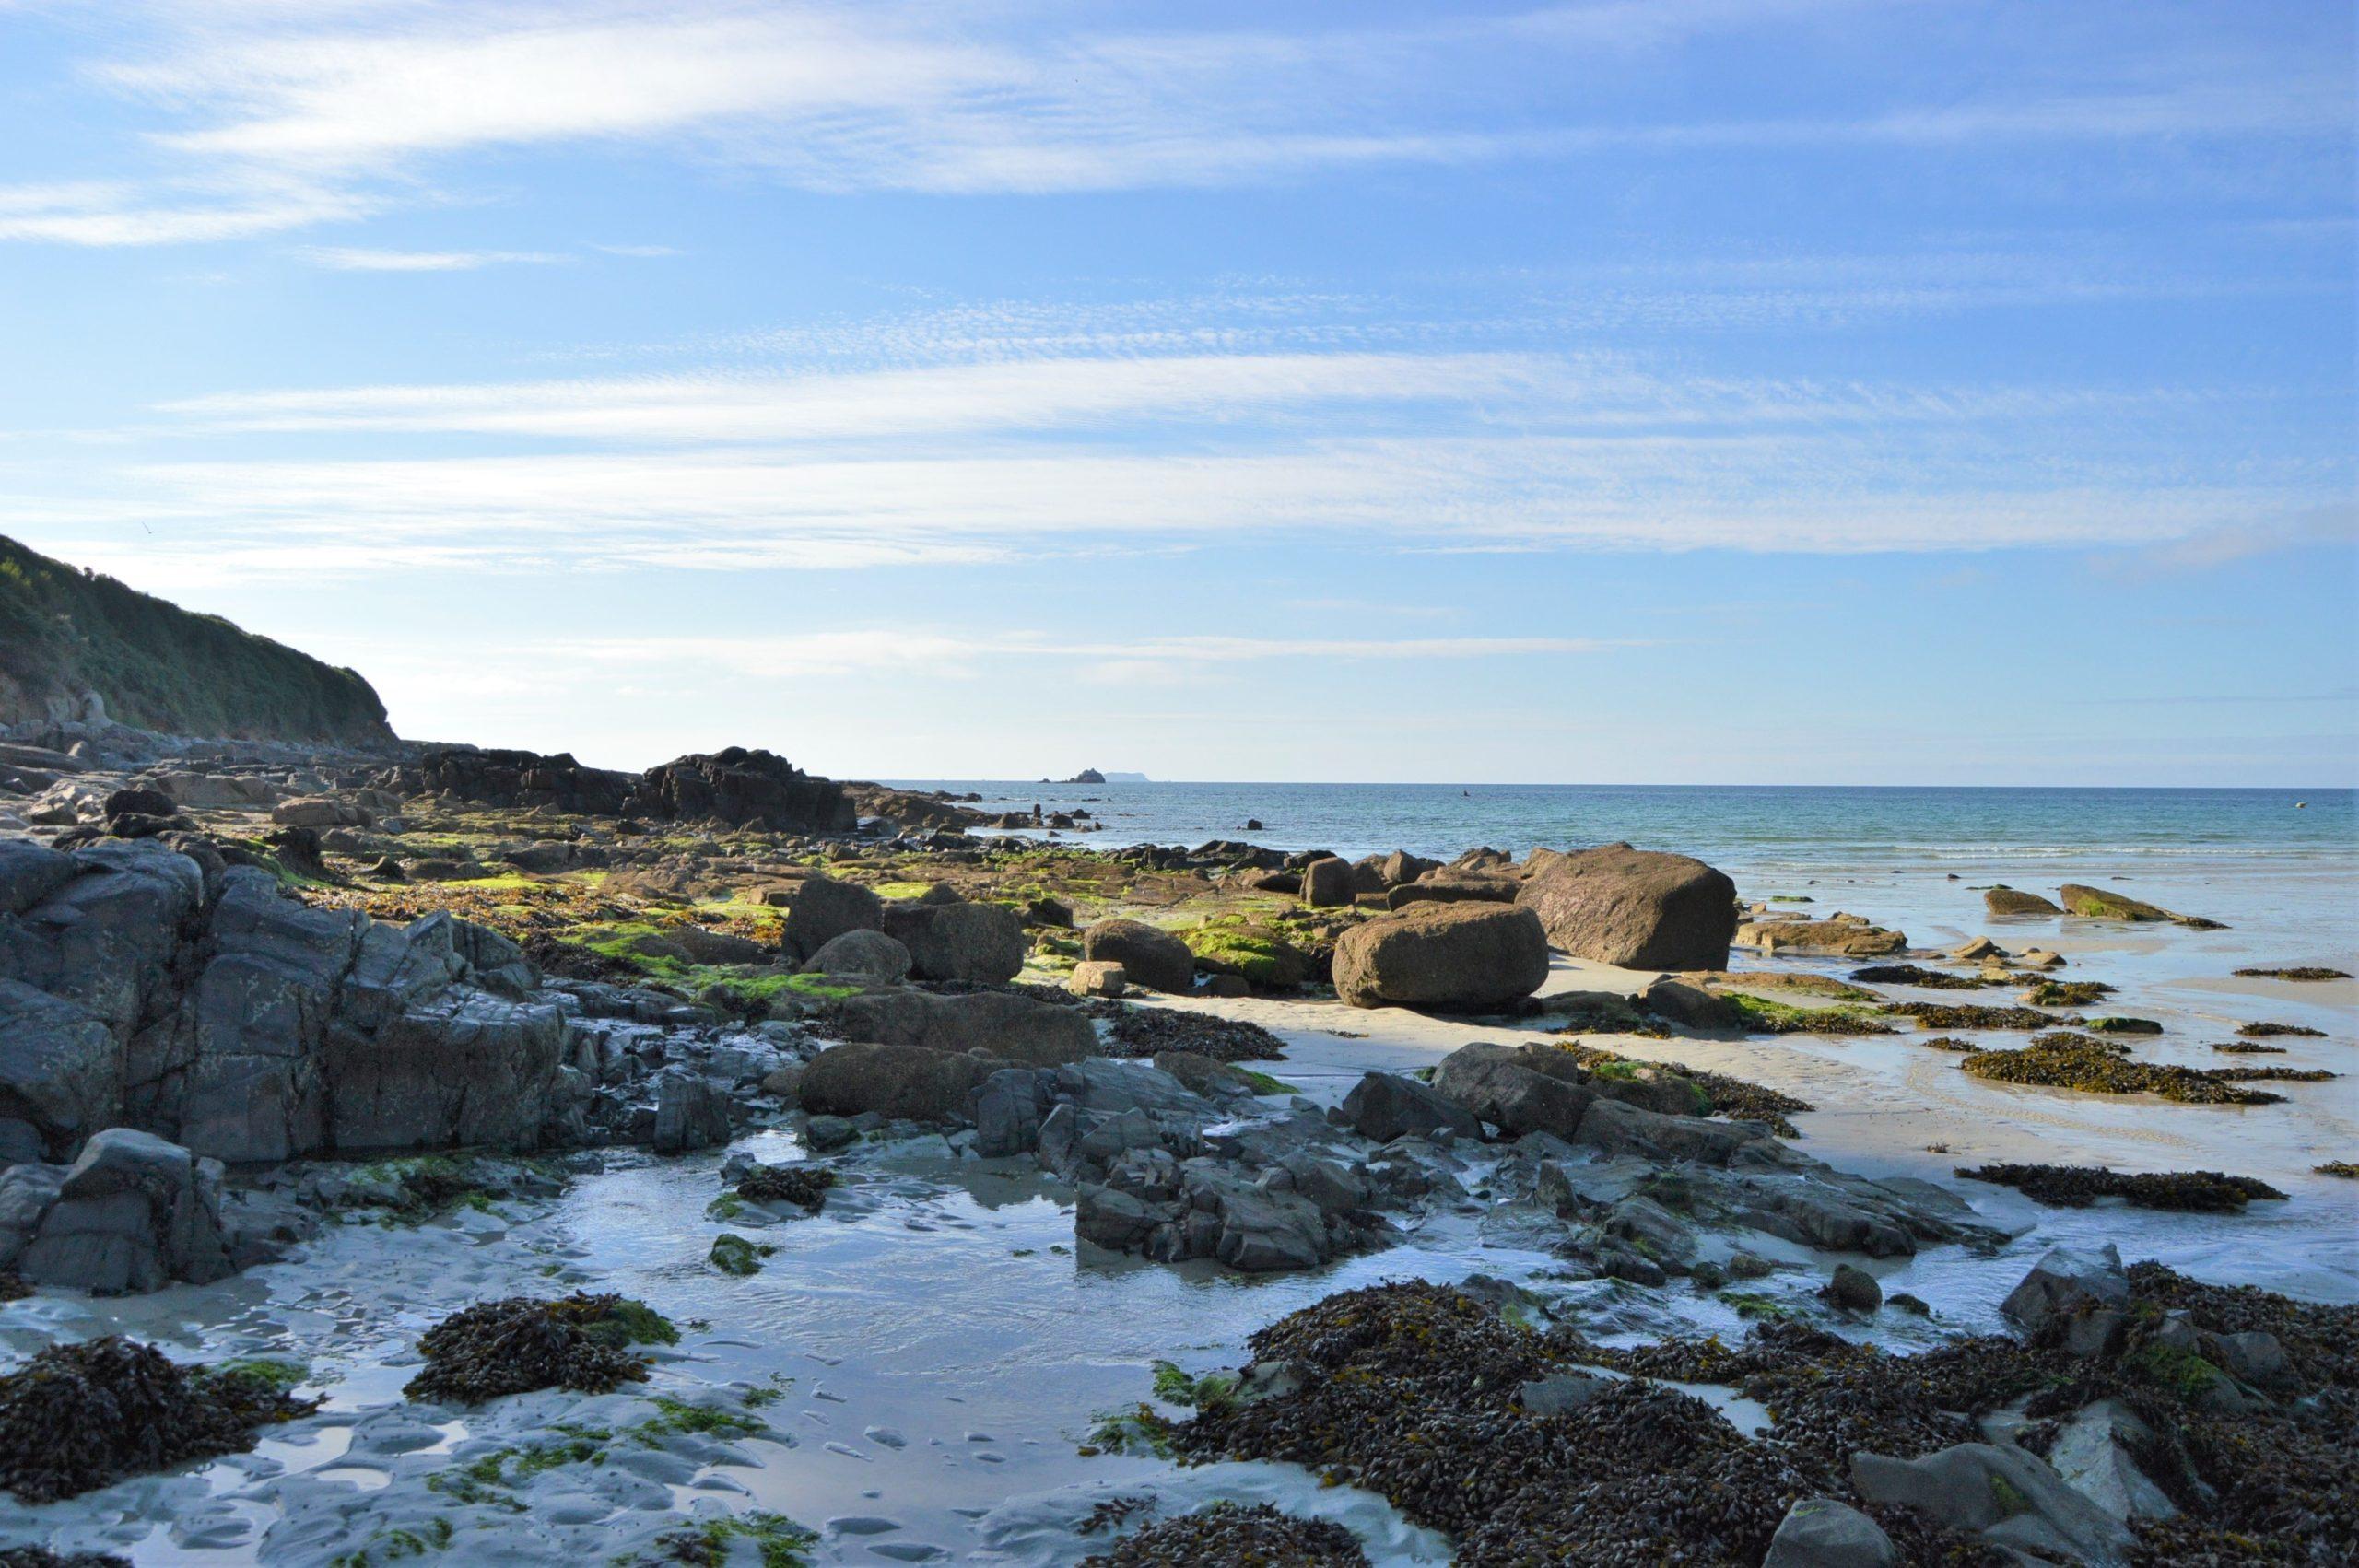 Granit Bretagne, photo Mélanie Martin